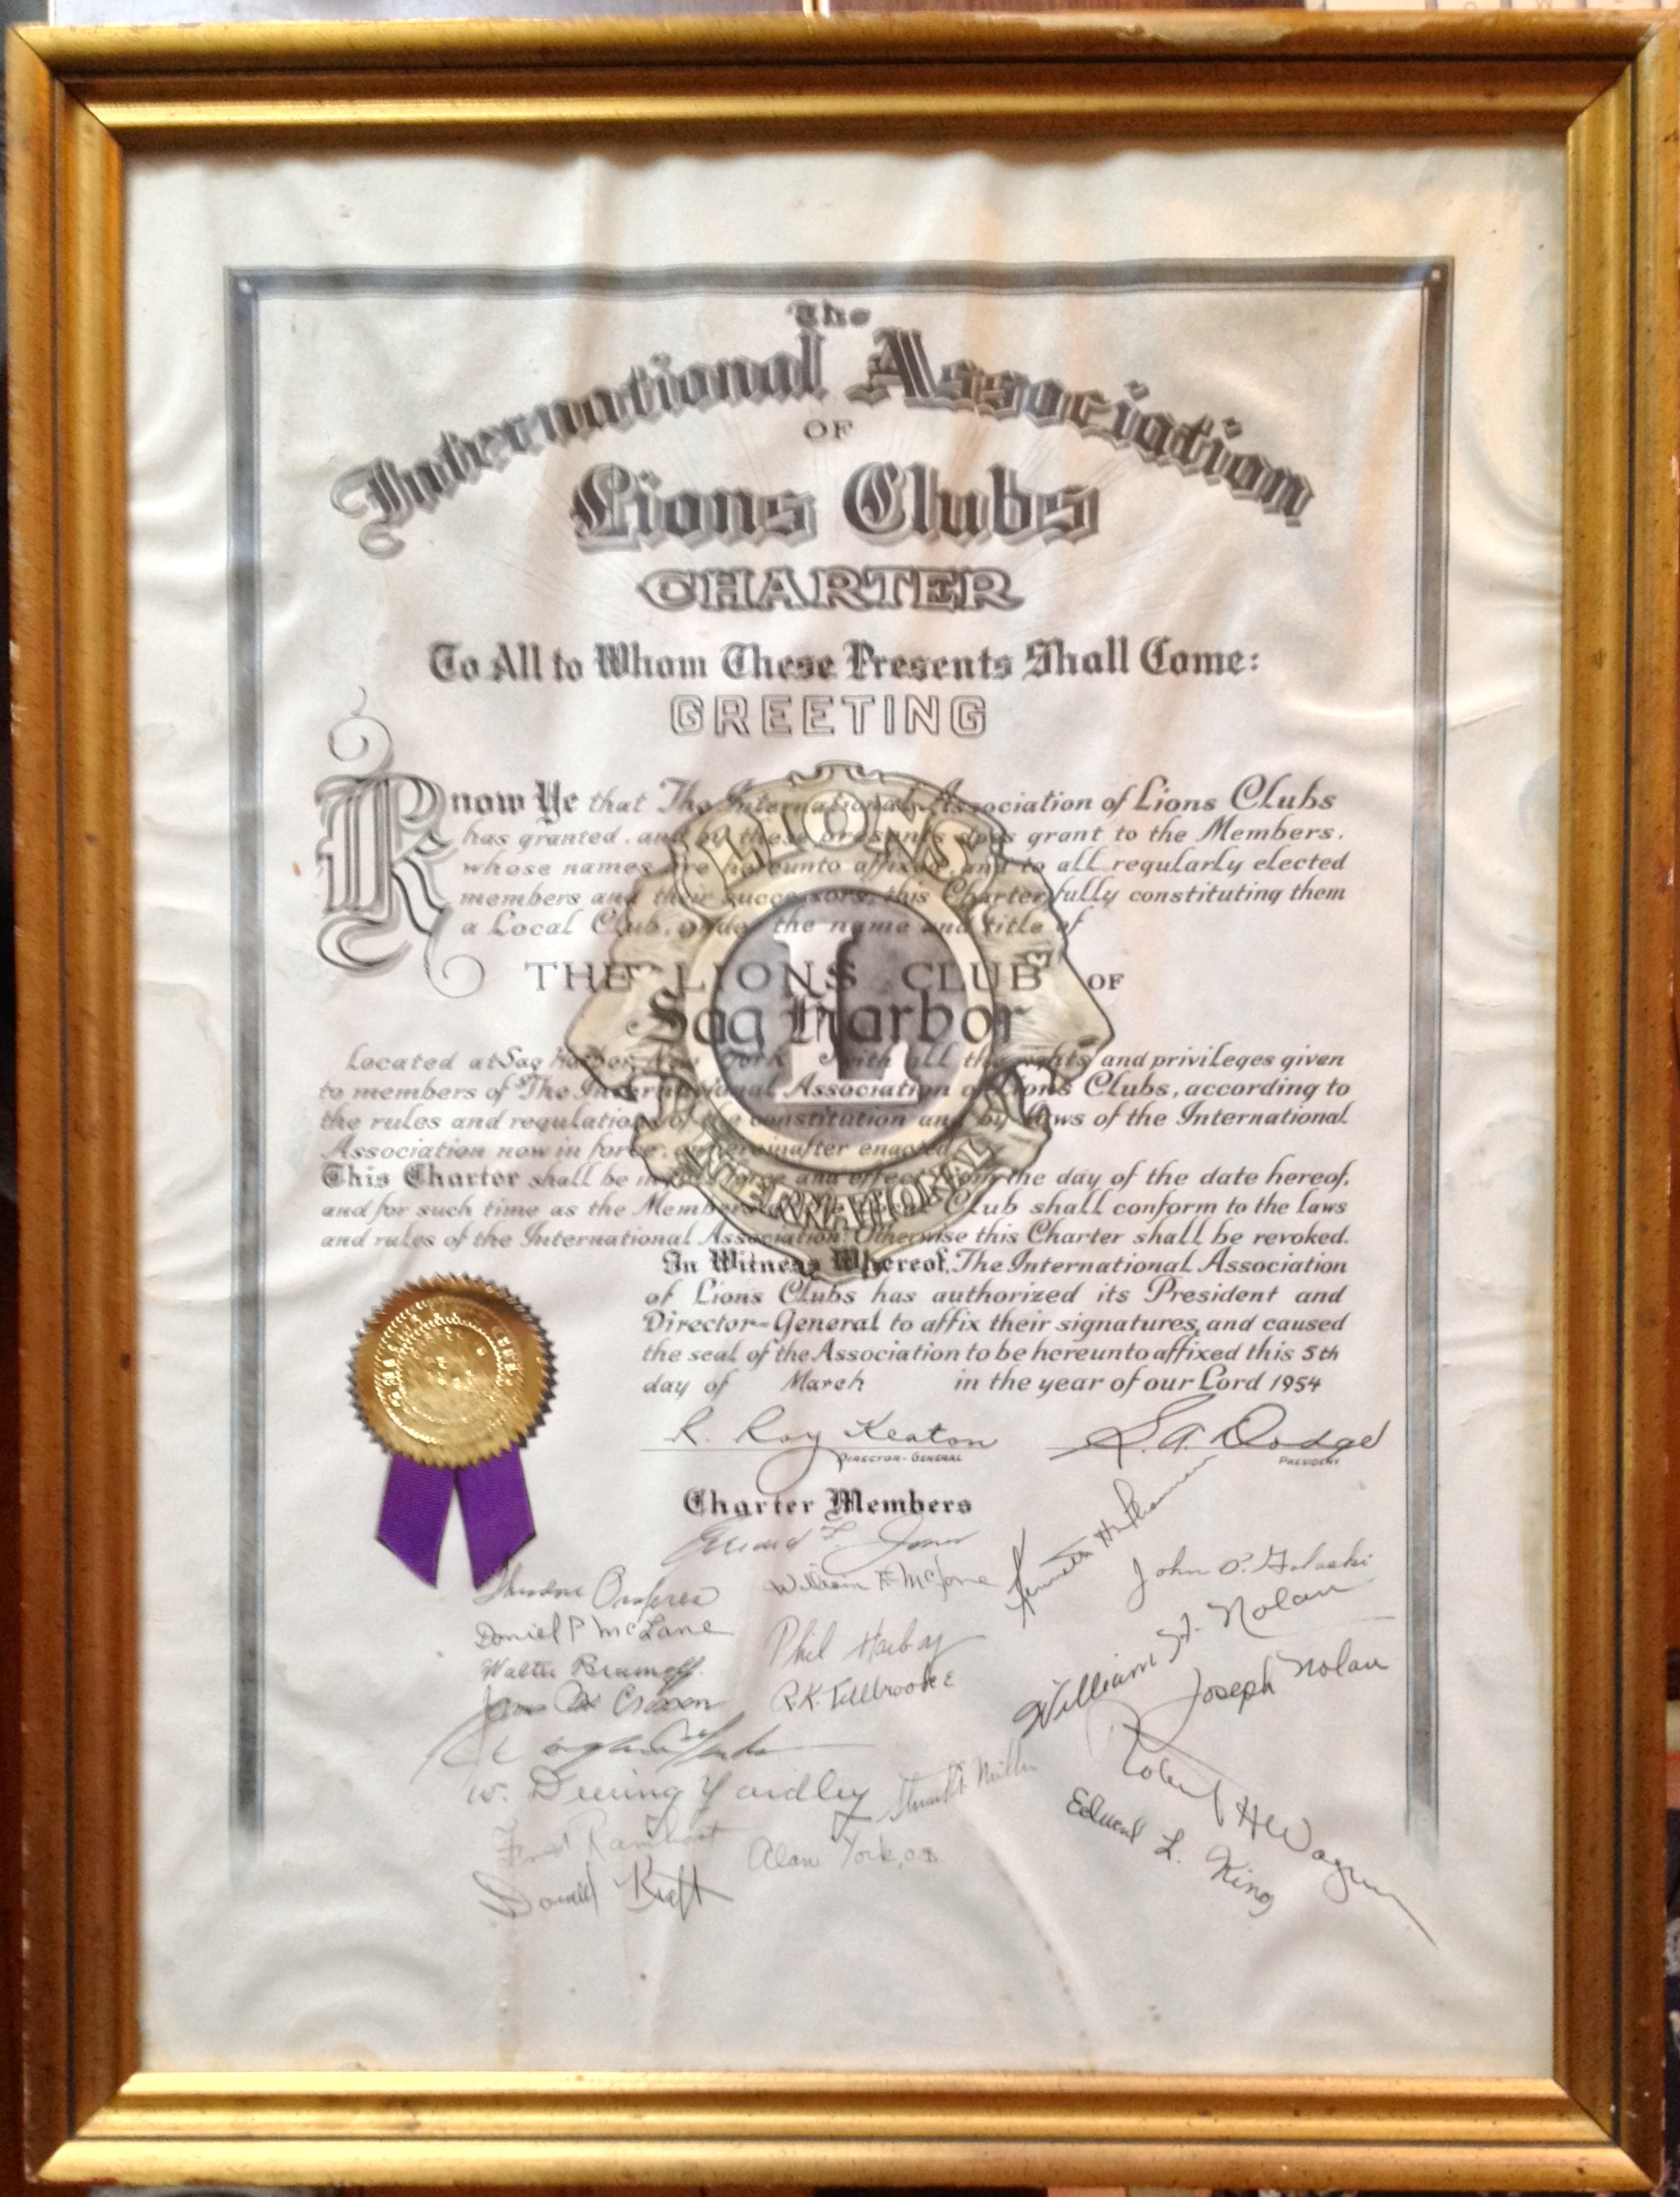 SHLC Charter